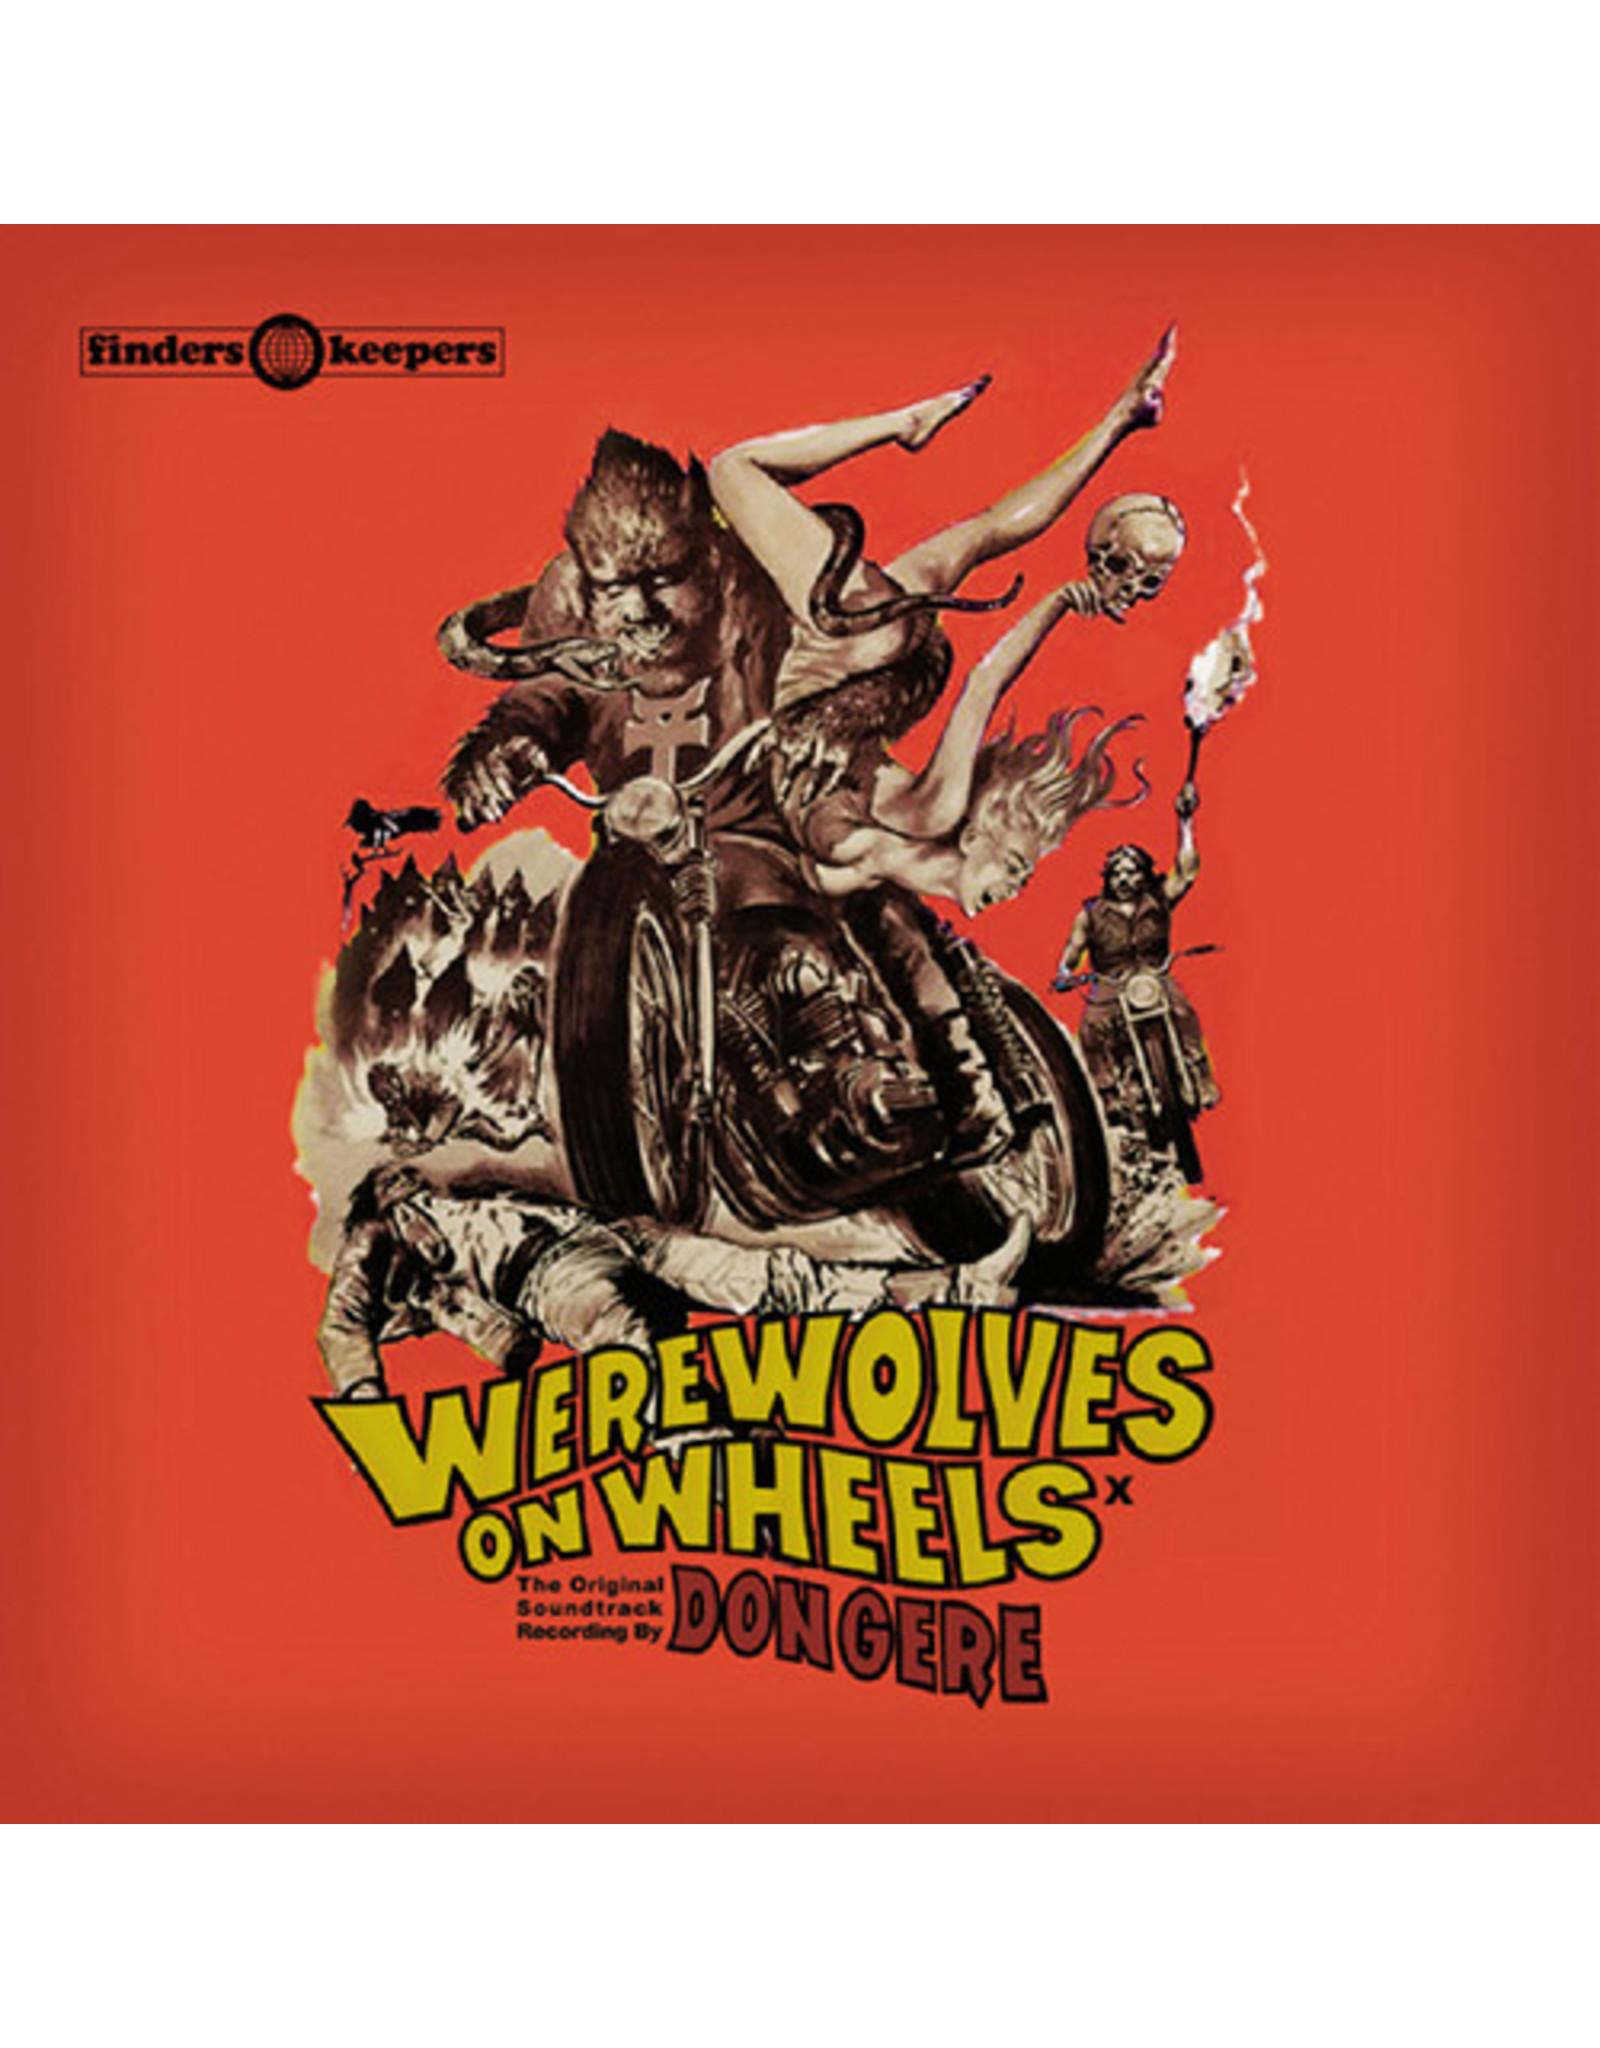 New Vinyl Don Gere - Werewolves On Wheels OST LP